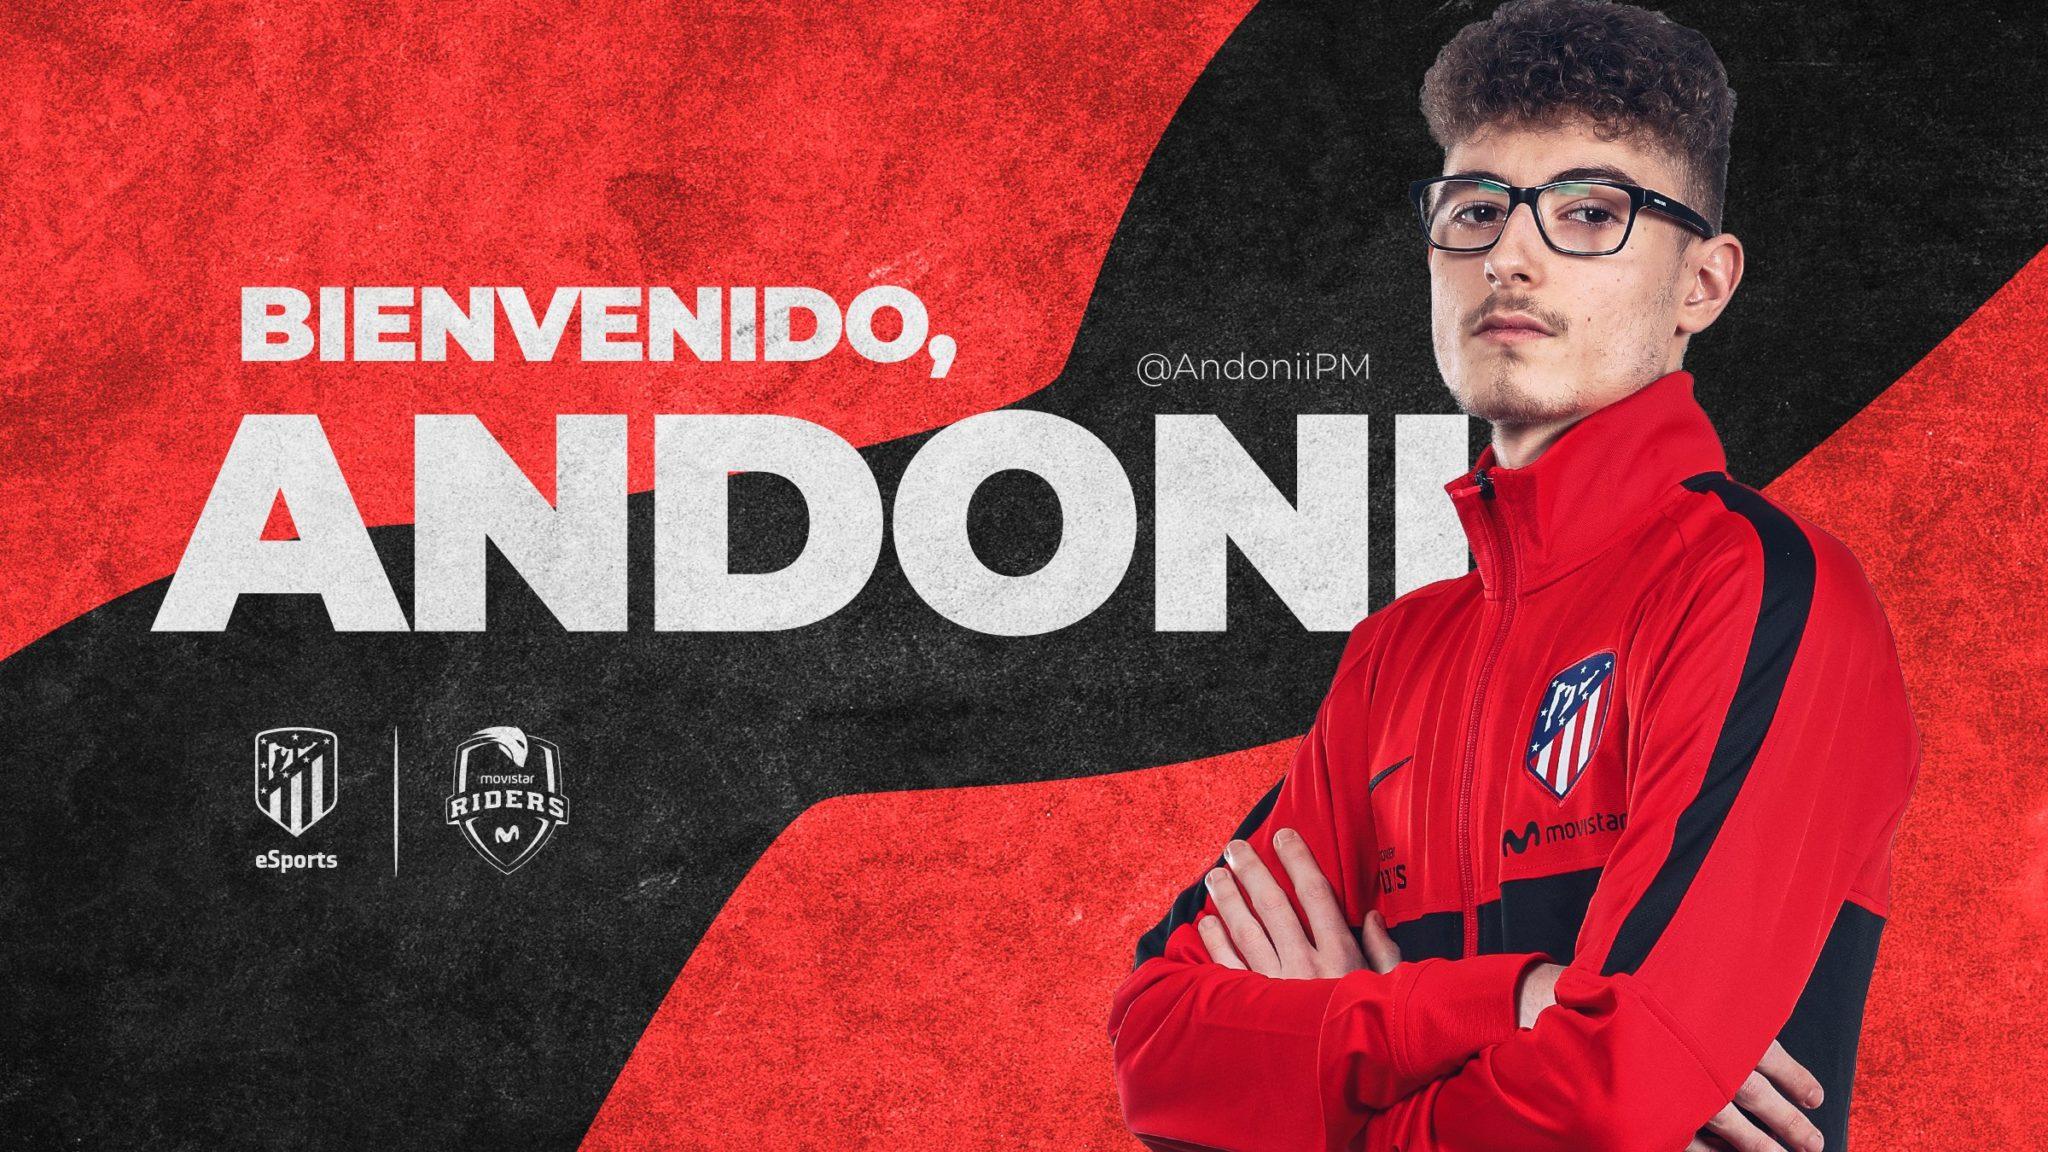 AndoniiPM Atleti Esports